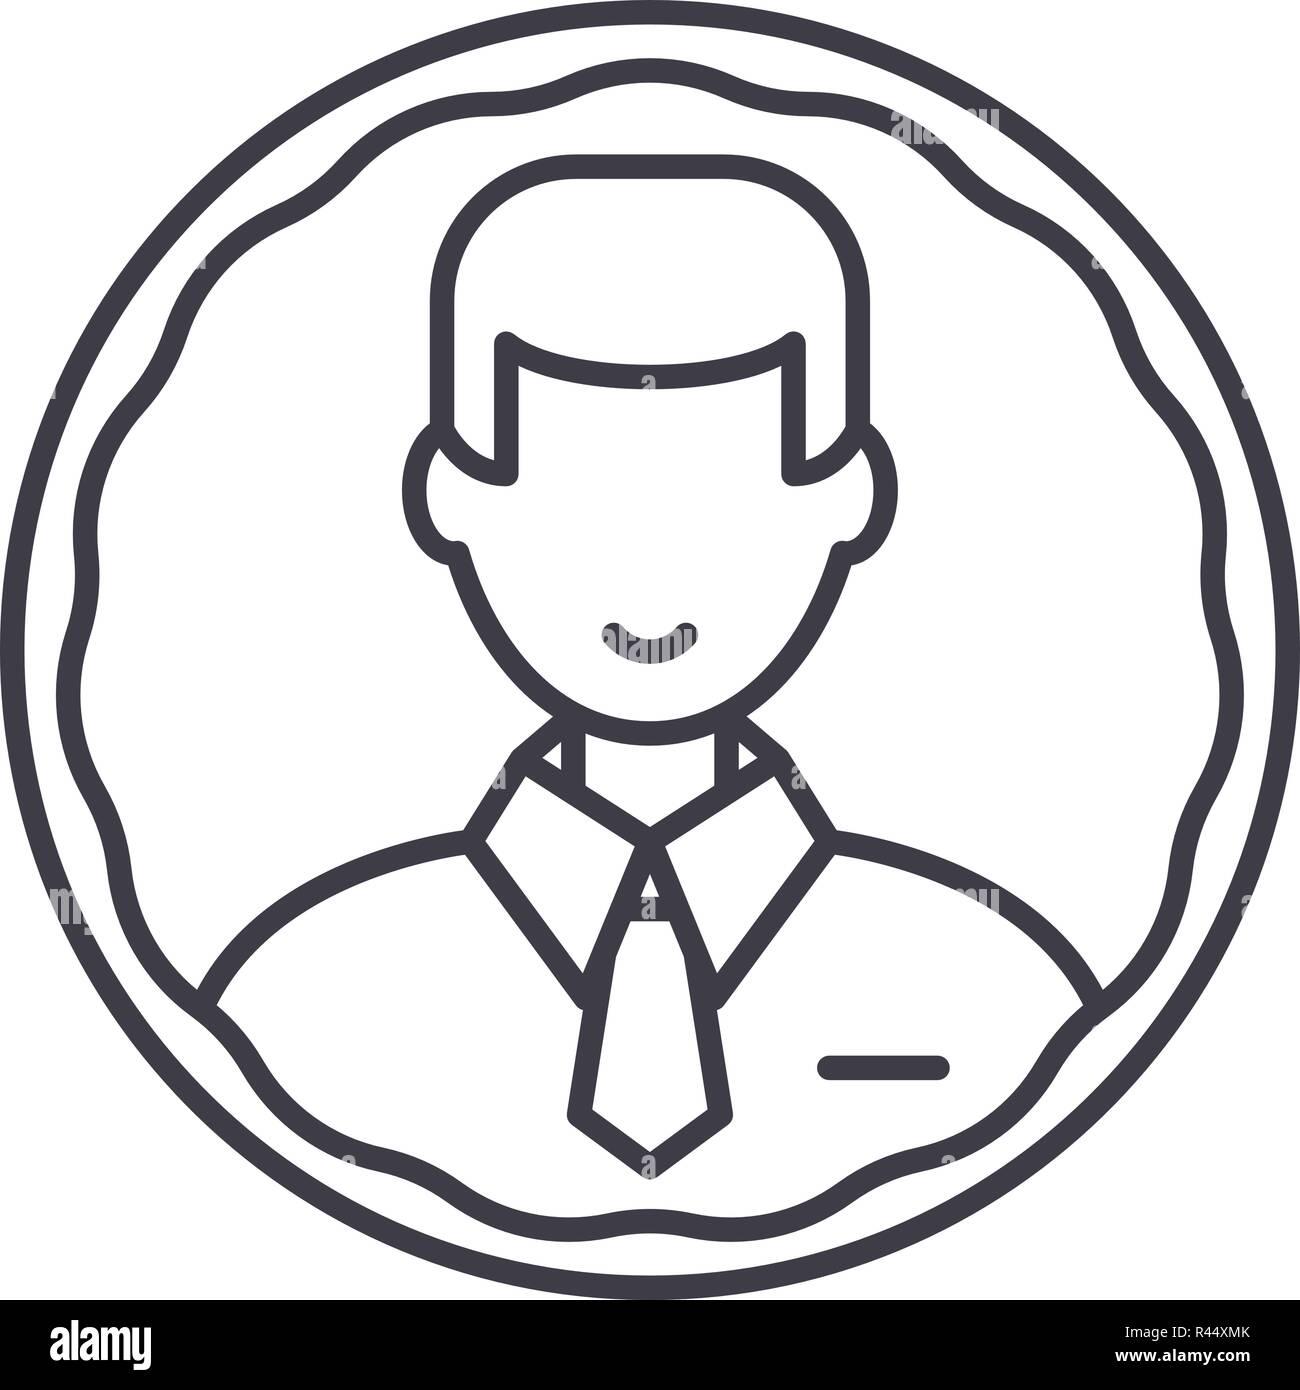 Staff profile line icon concept. Staff profile vector linear illustration, symbol, sign - Stock Image